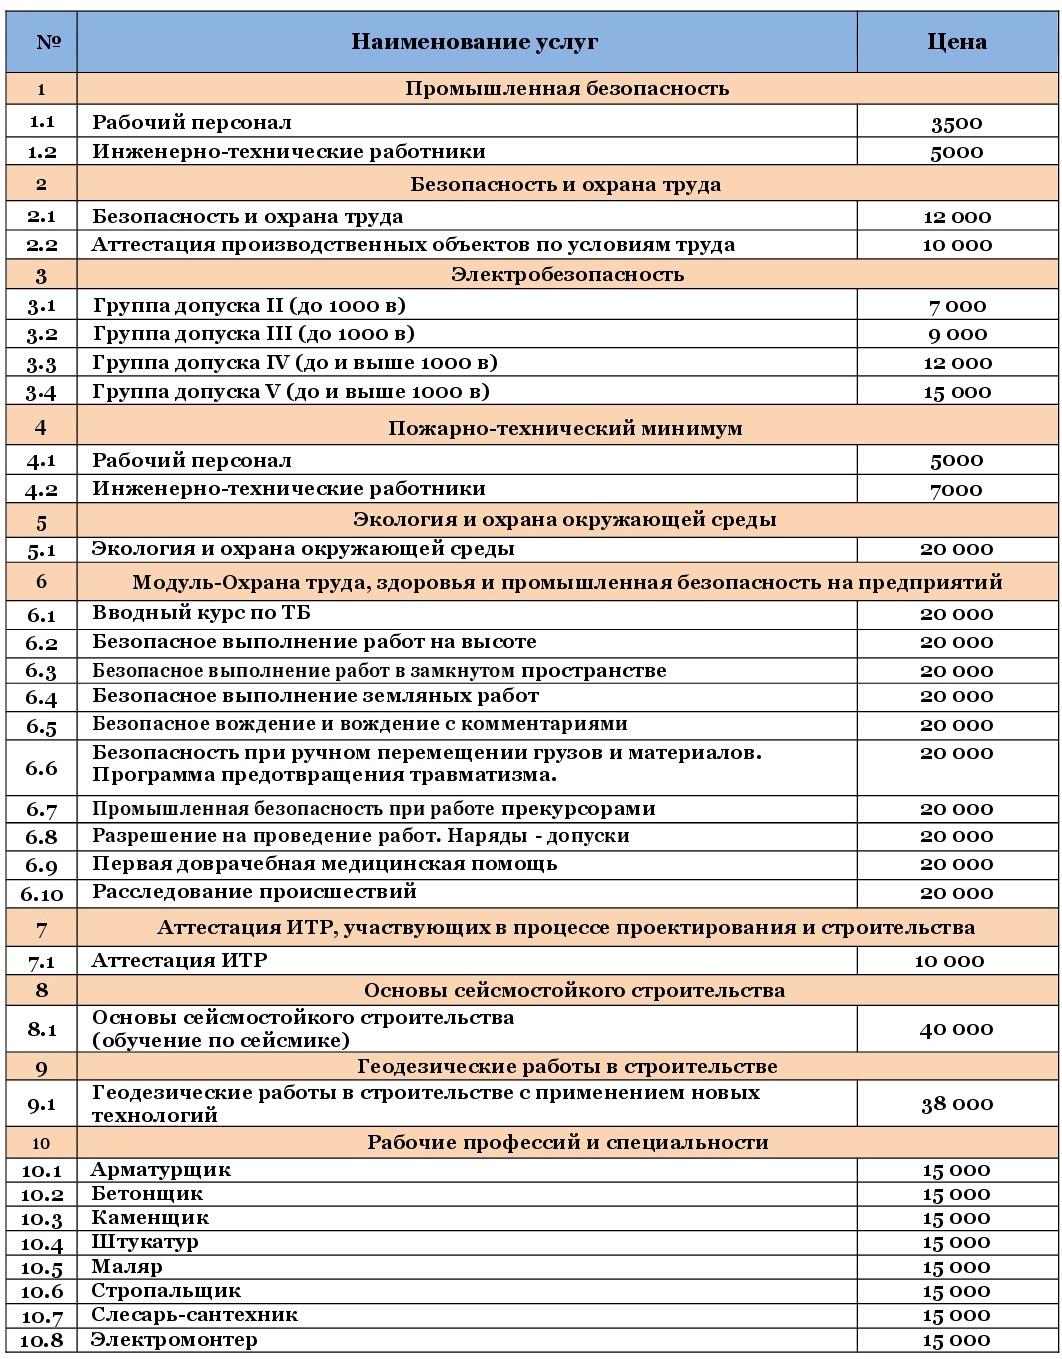 AISC Прайс-лист на 2018 год